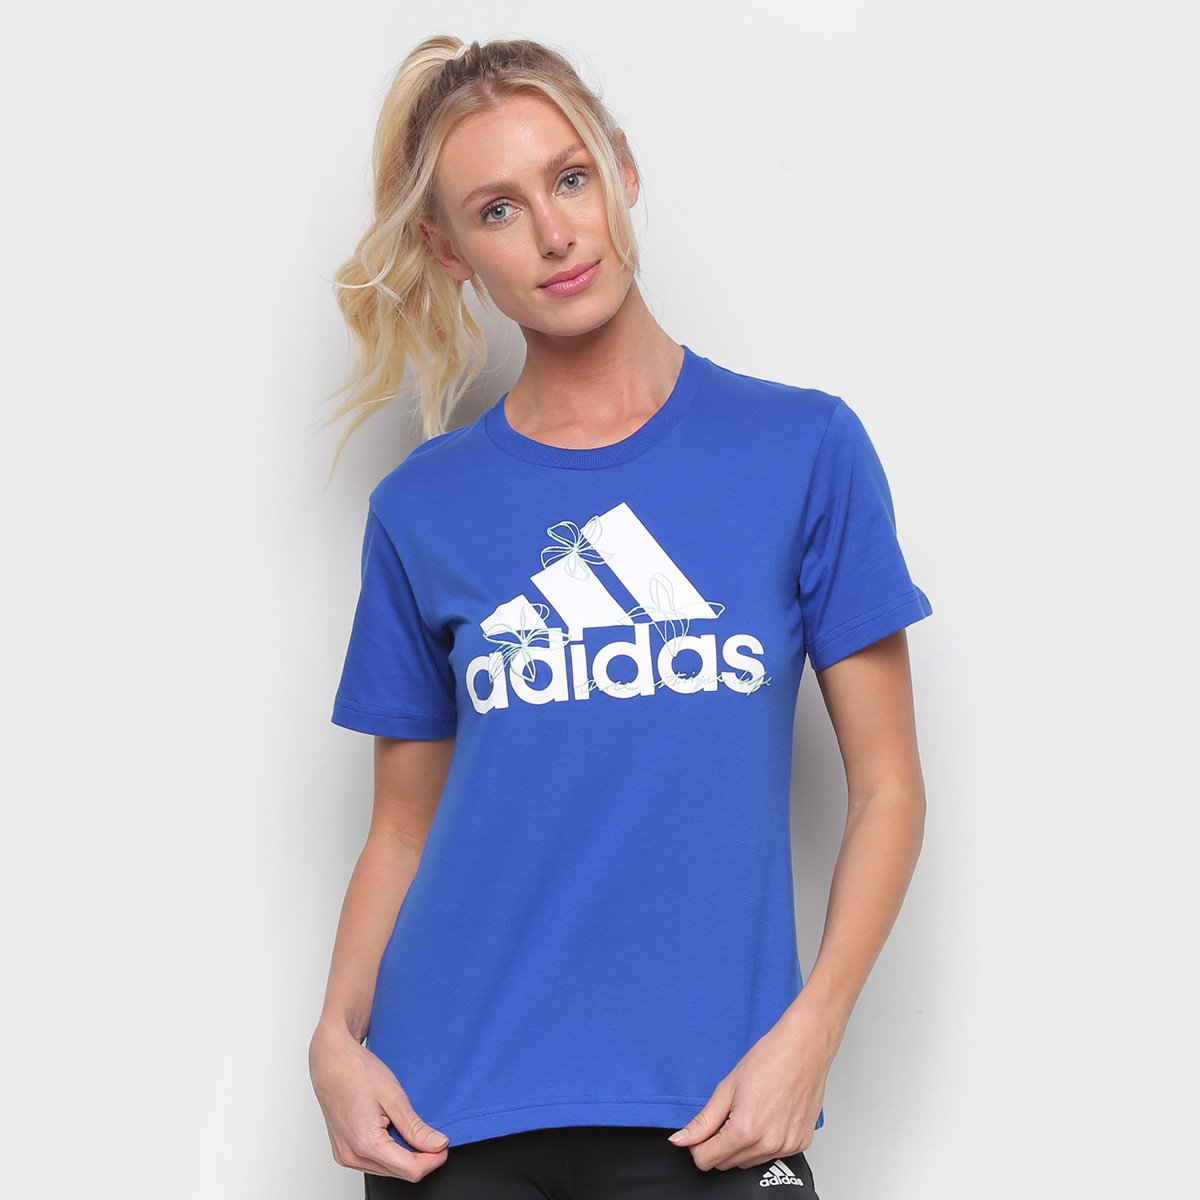 Camiseta Adidas Floral Feminina - Azul Royal